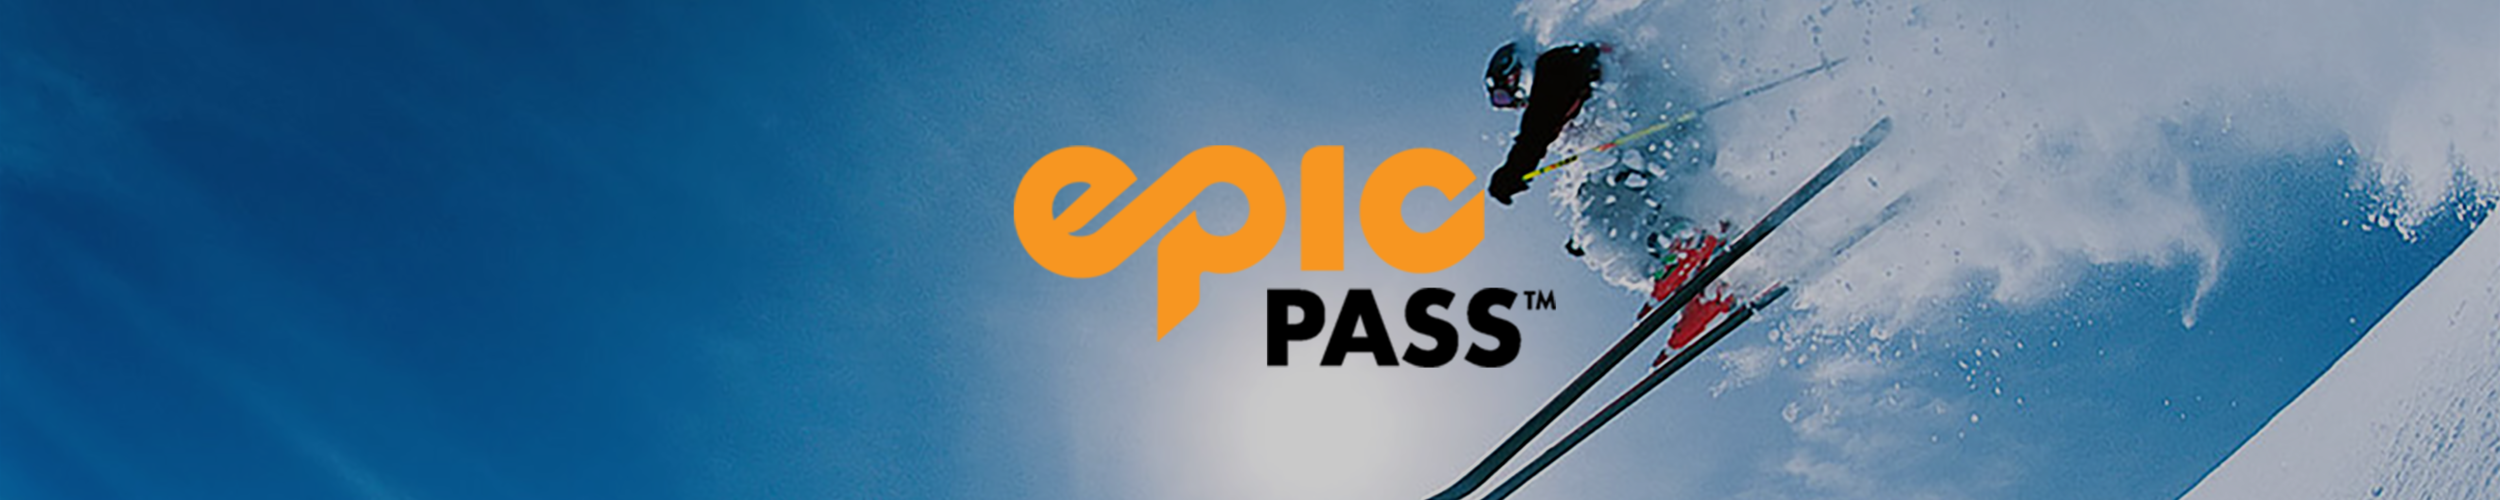 Epic-Pass